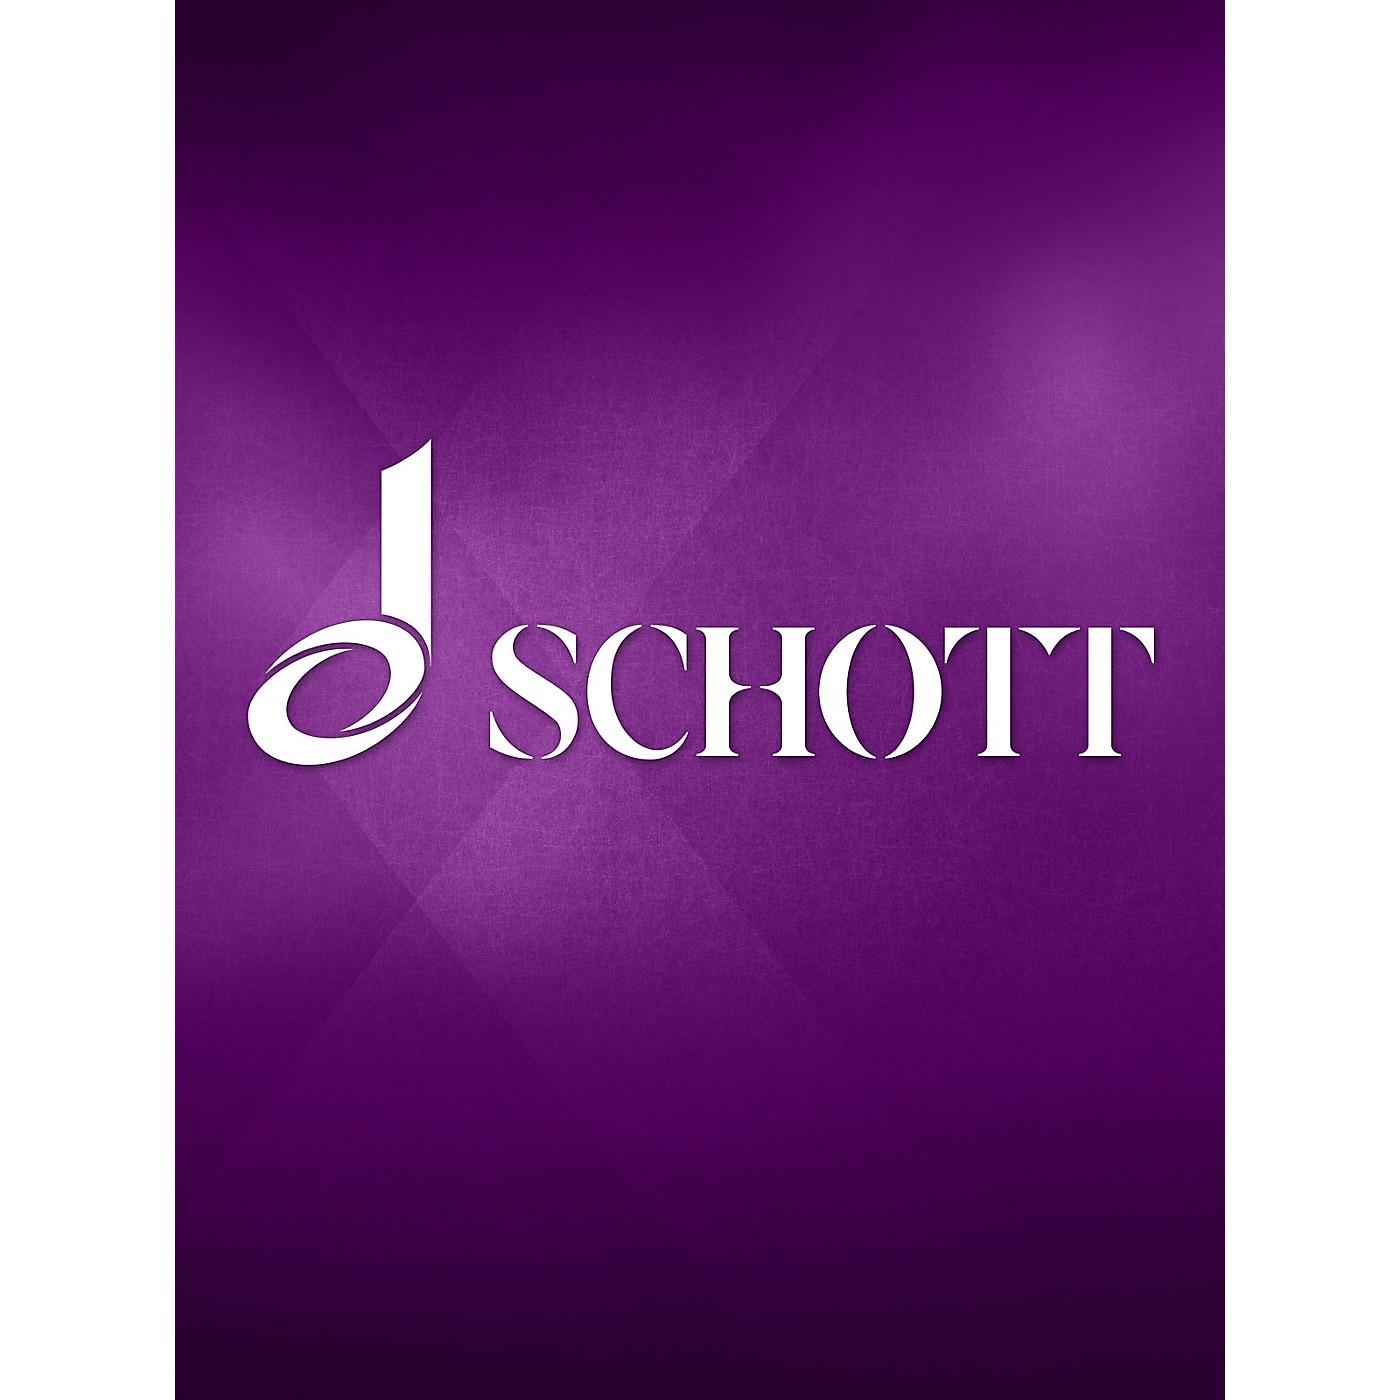 Schott Kreisler Mw5 Corelli Sarabande Vln Pft Schott Series by Corelli thumbnail